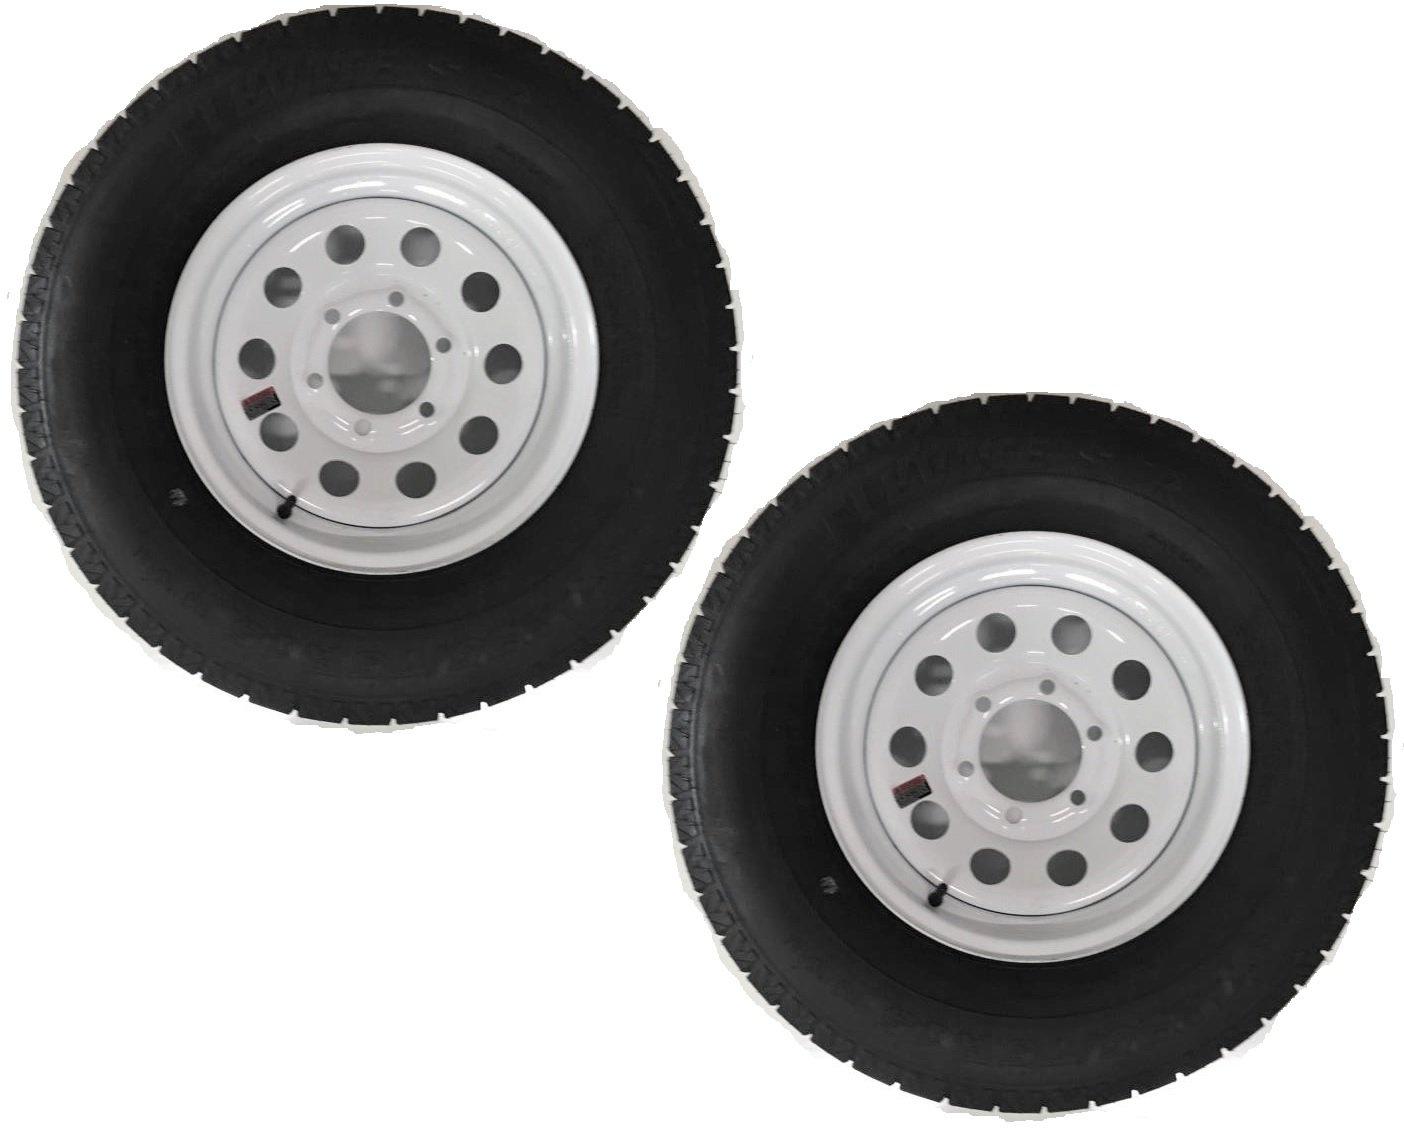 Two Radial Trailer Tires & Rims ST225/75R15 225/75-15 15'' D 6 Lug White Modular